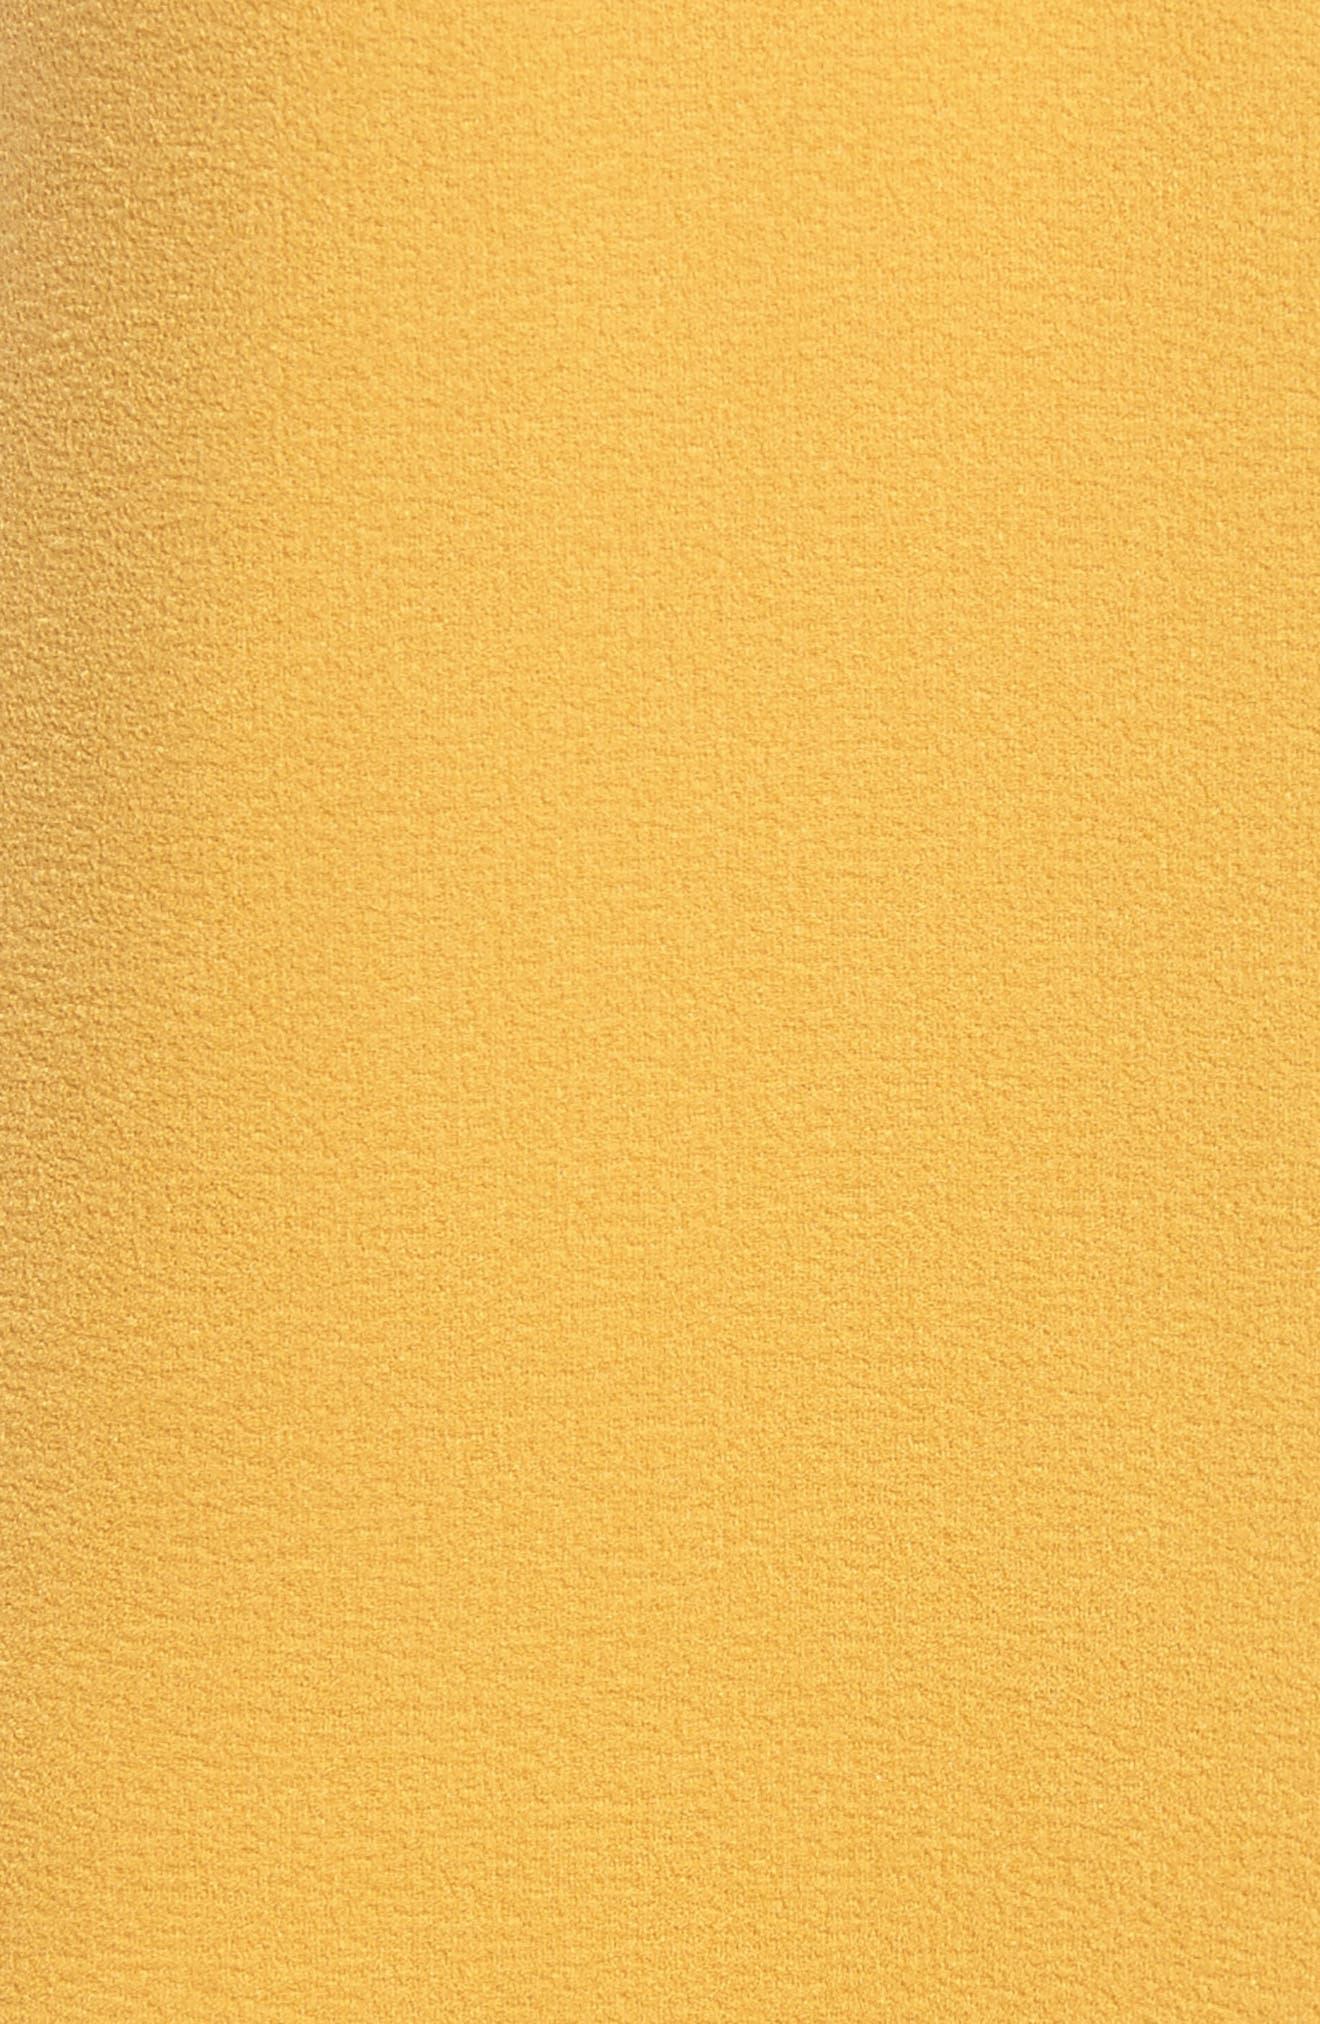 Hailey Crepe Dress,                             Alternate thumbnail 137, color,